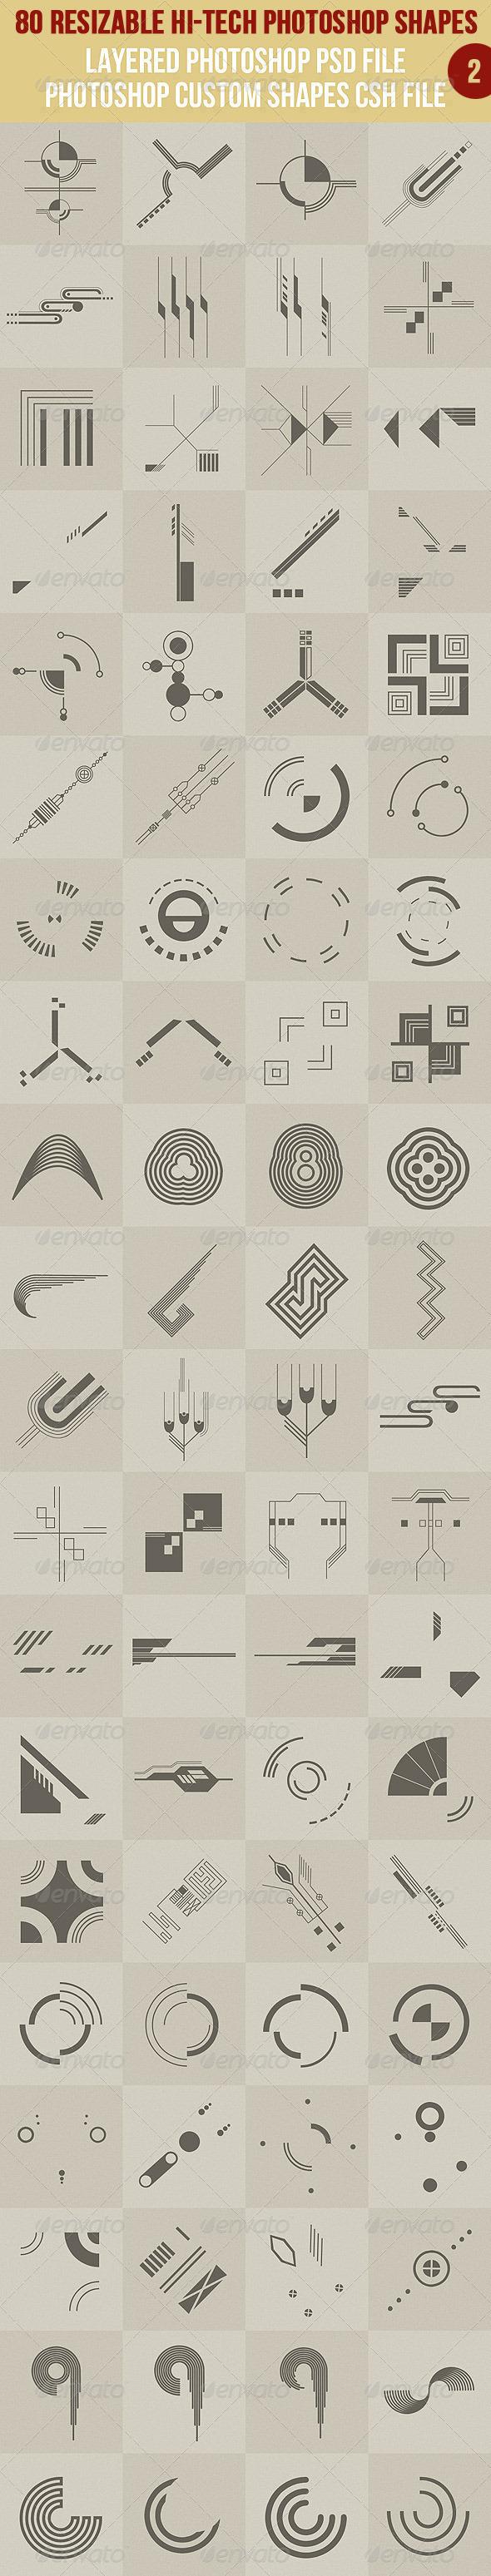 80 Photoshop Hi-Tech Shapes 2 - Symbols Shapes